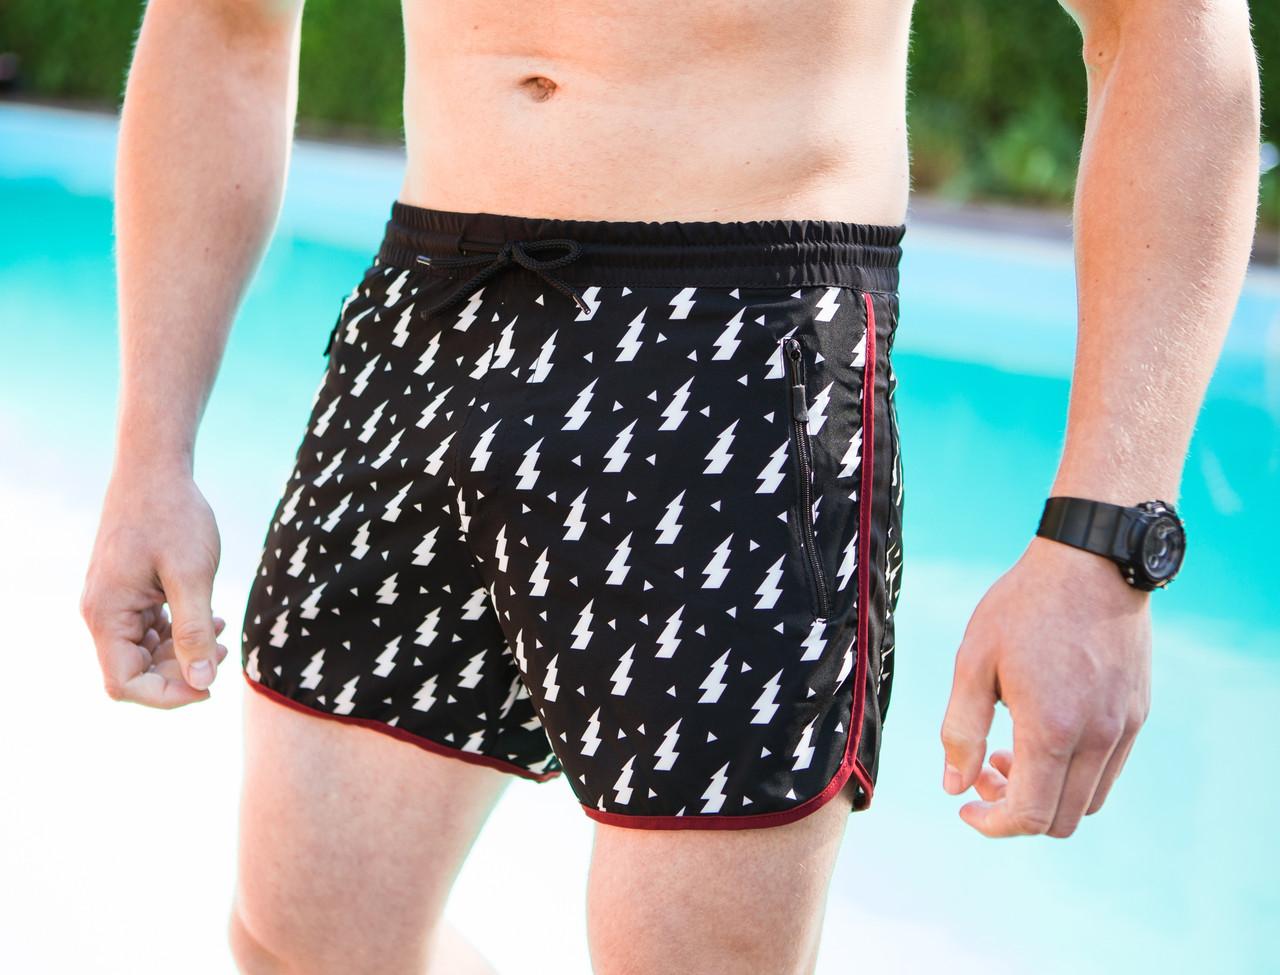 a45a17bf532b0 Шорты мужские пляжные короткие плавки /